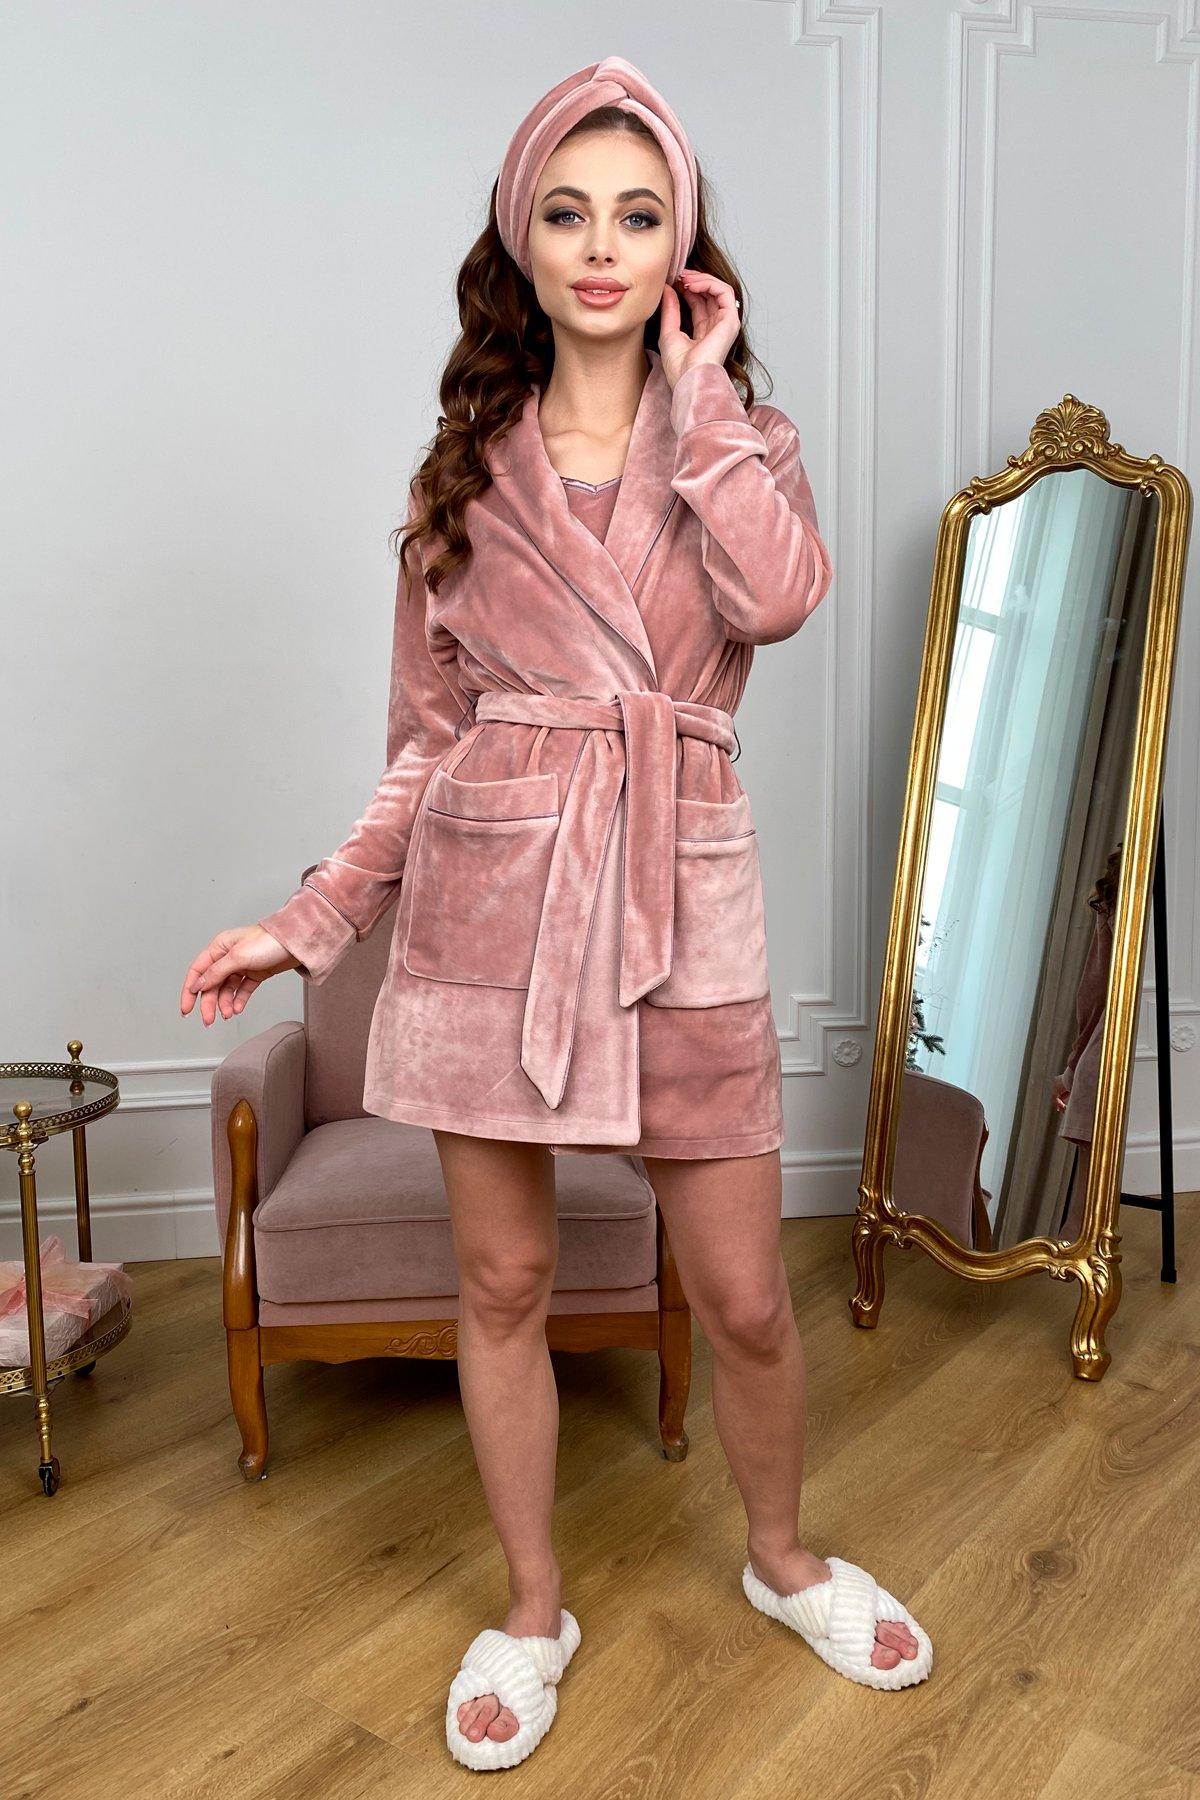 Женская одежда оптом Украина Modus Сандрин халат  велюр   атлас 10466